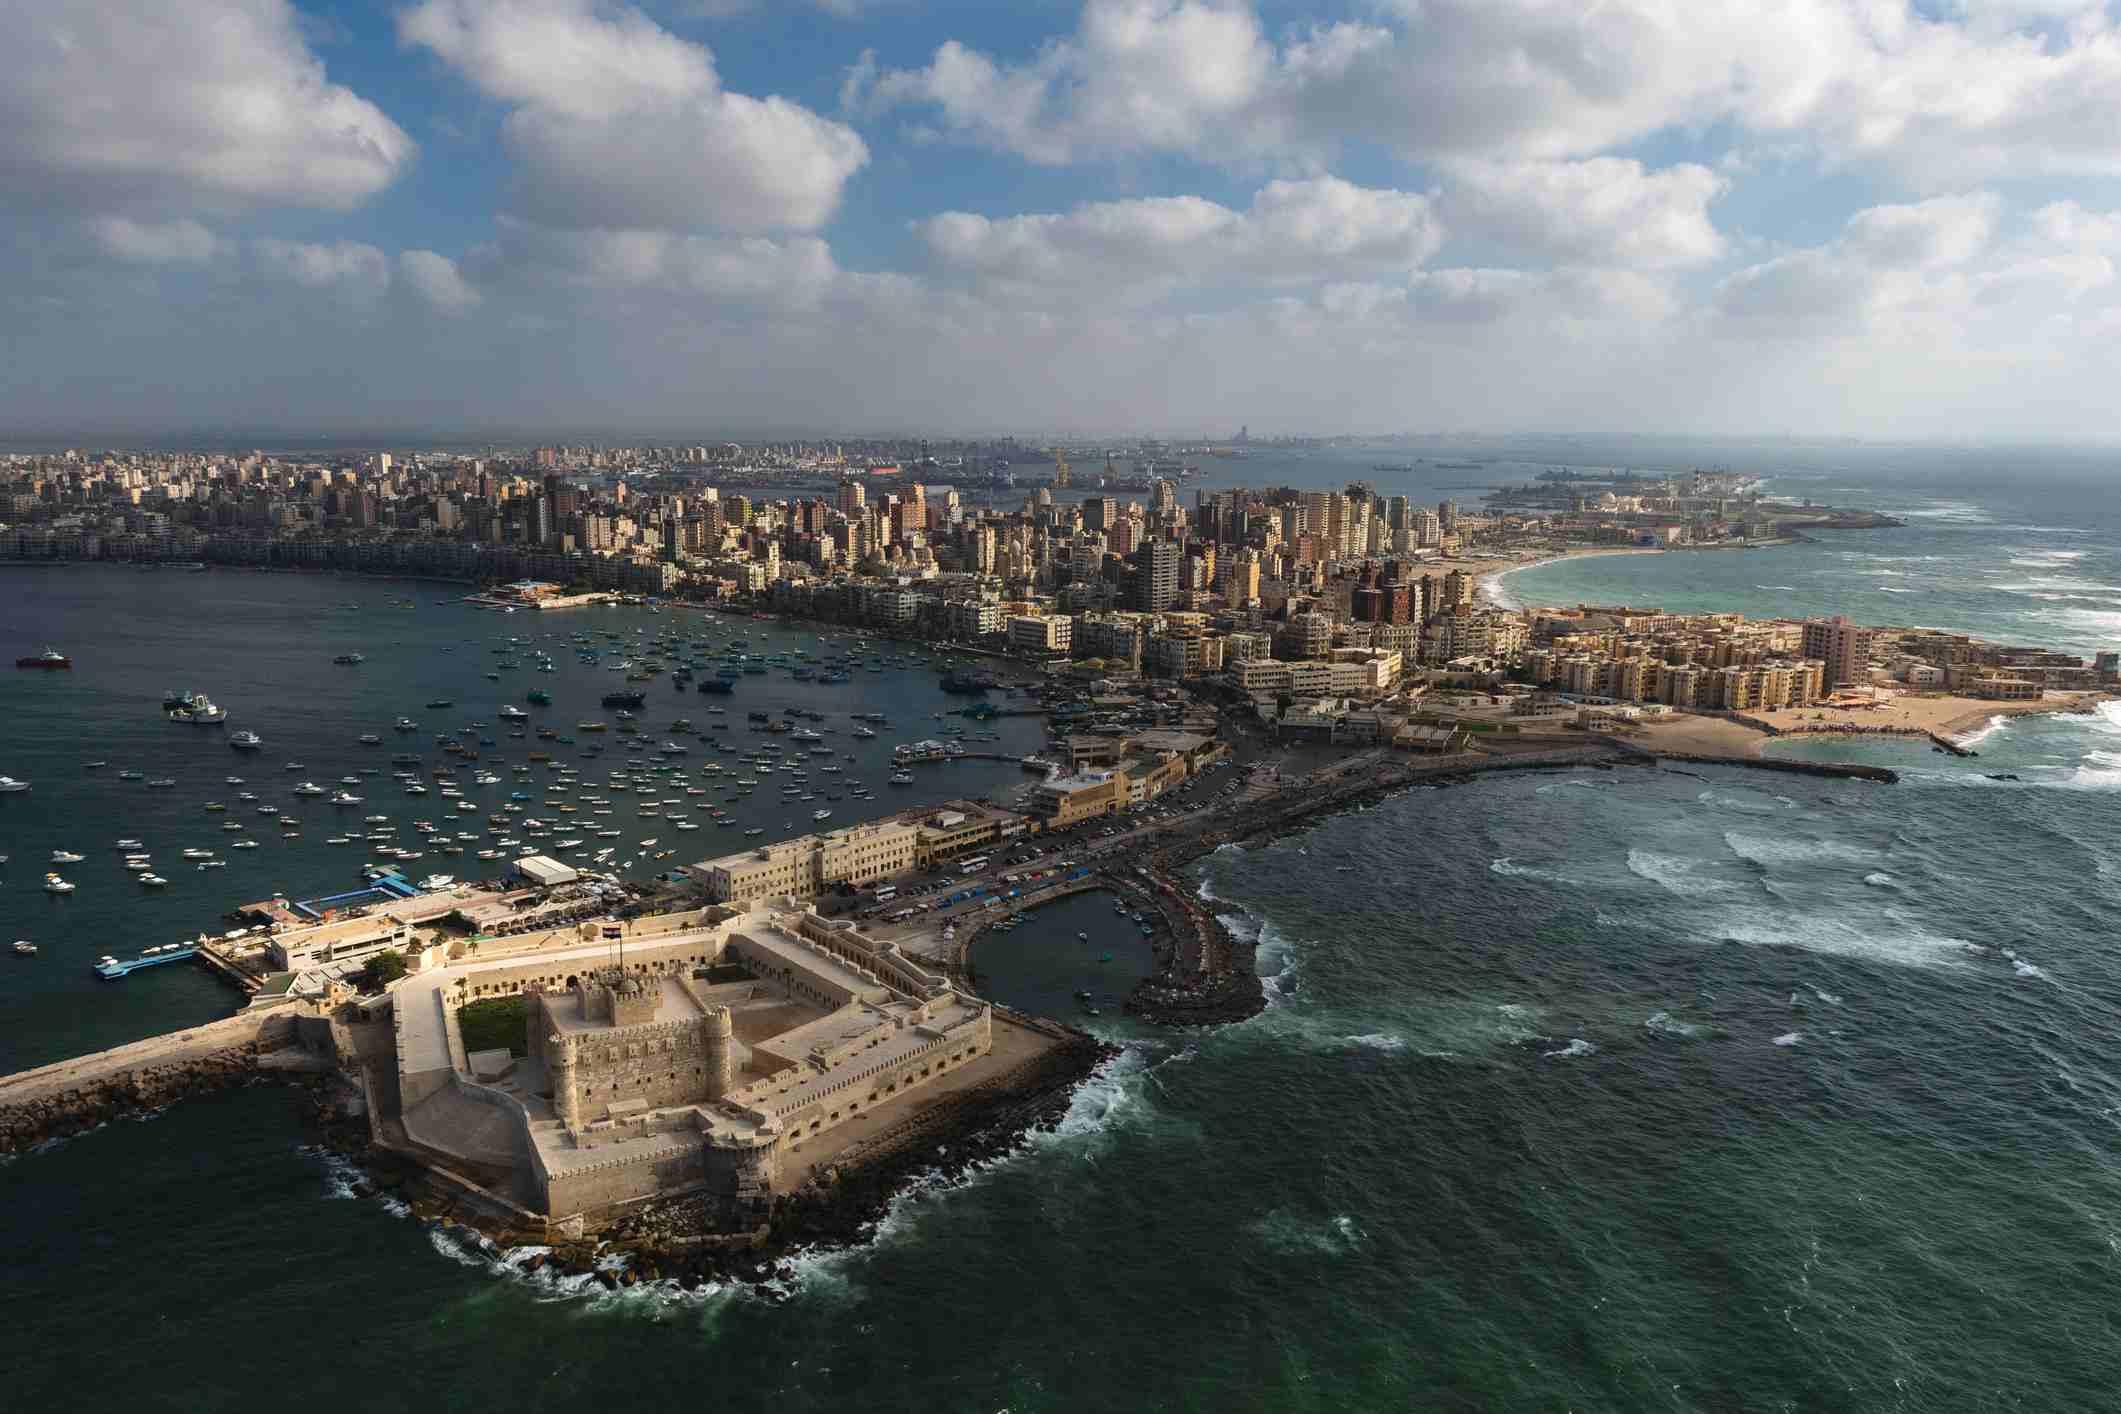 Aerial view of Alexandria, Egypt